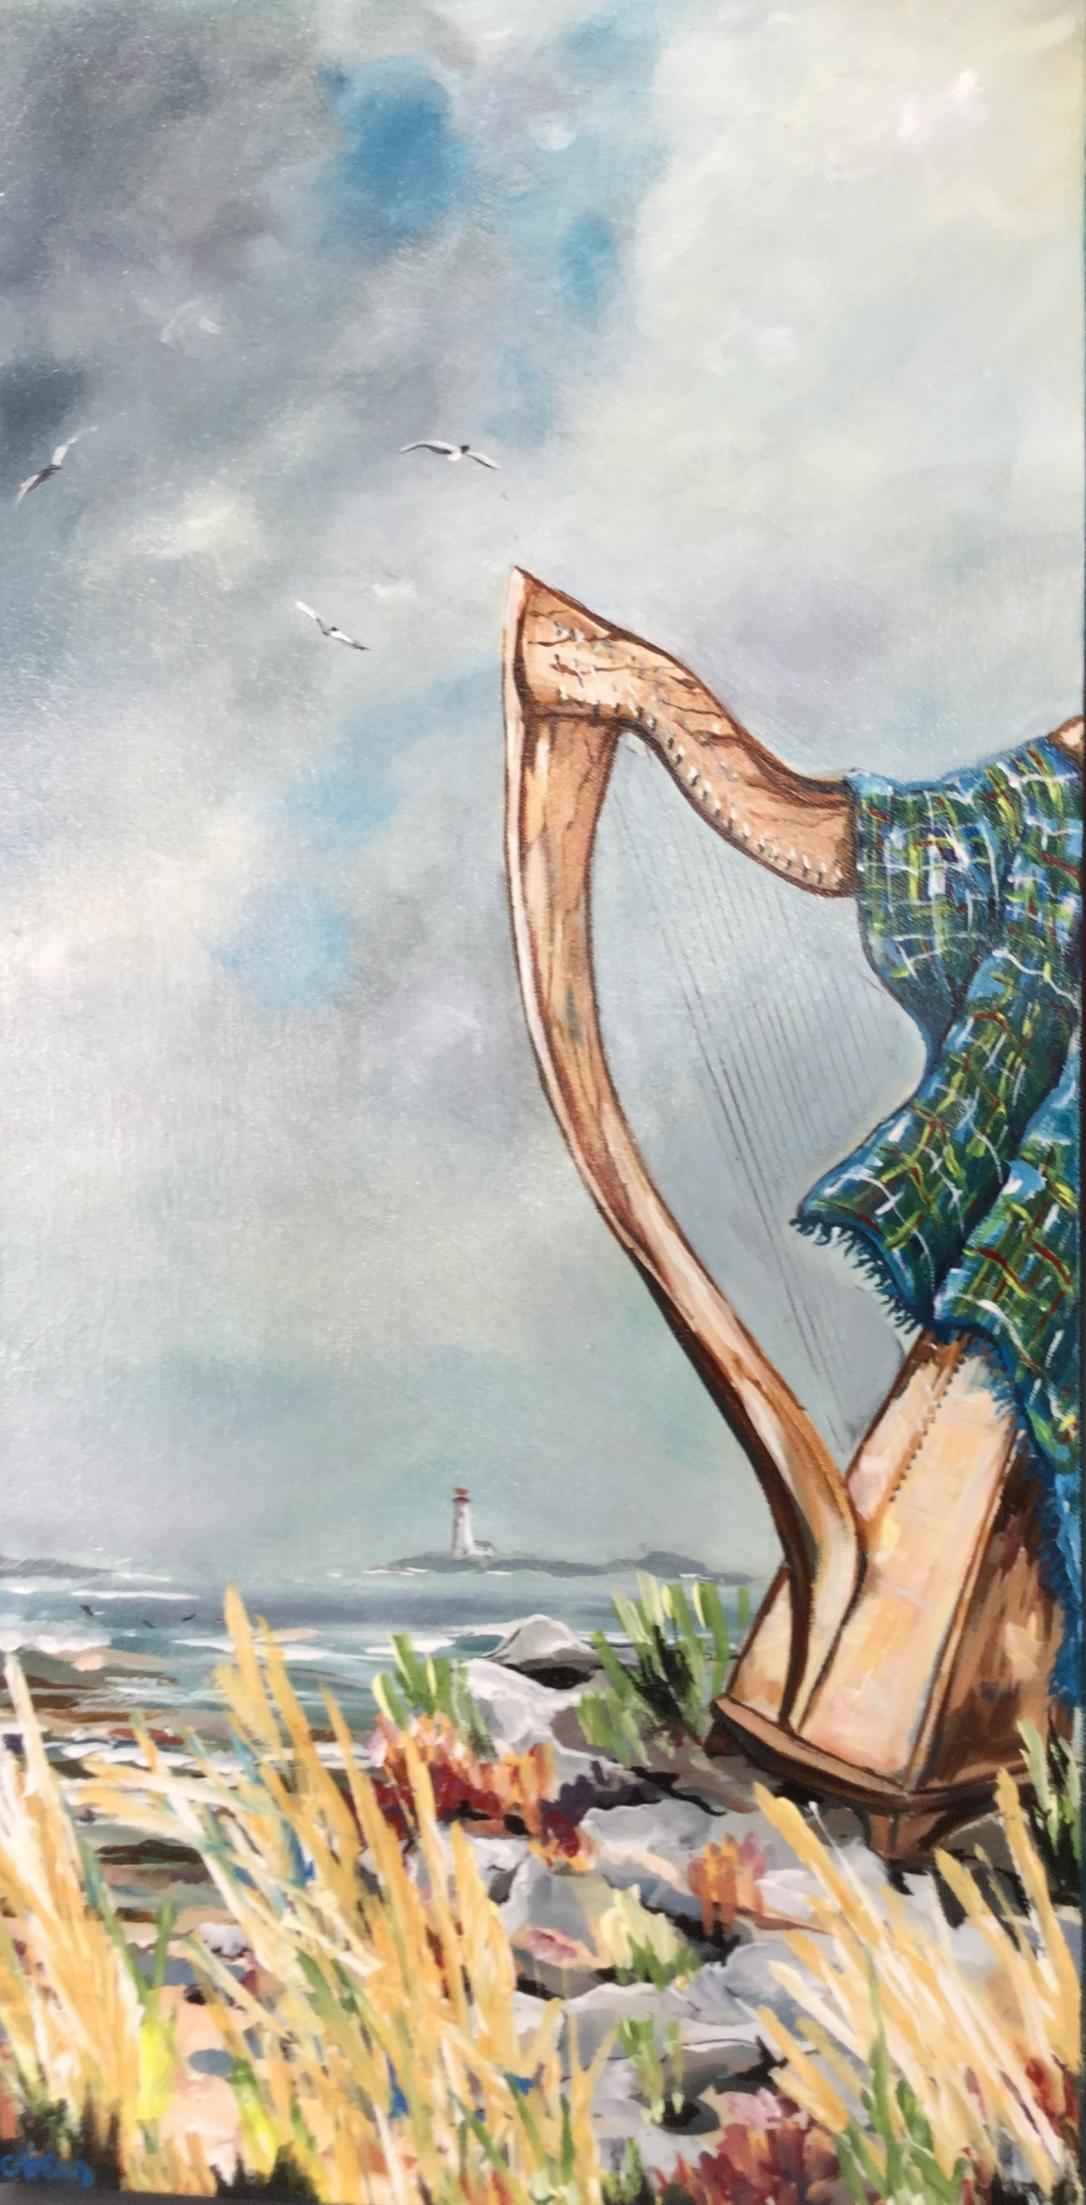 Cris' harp festival painting